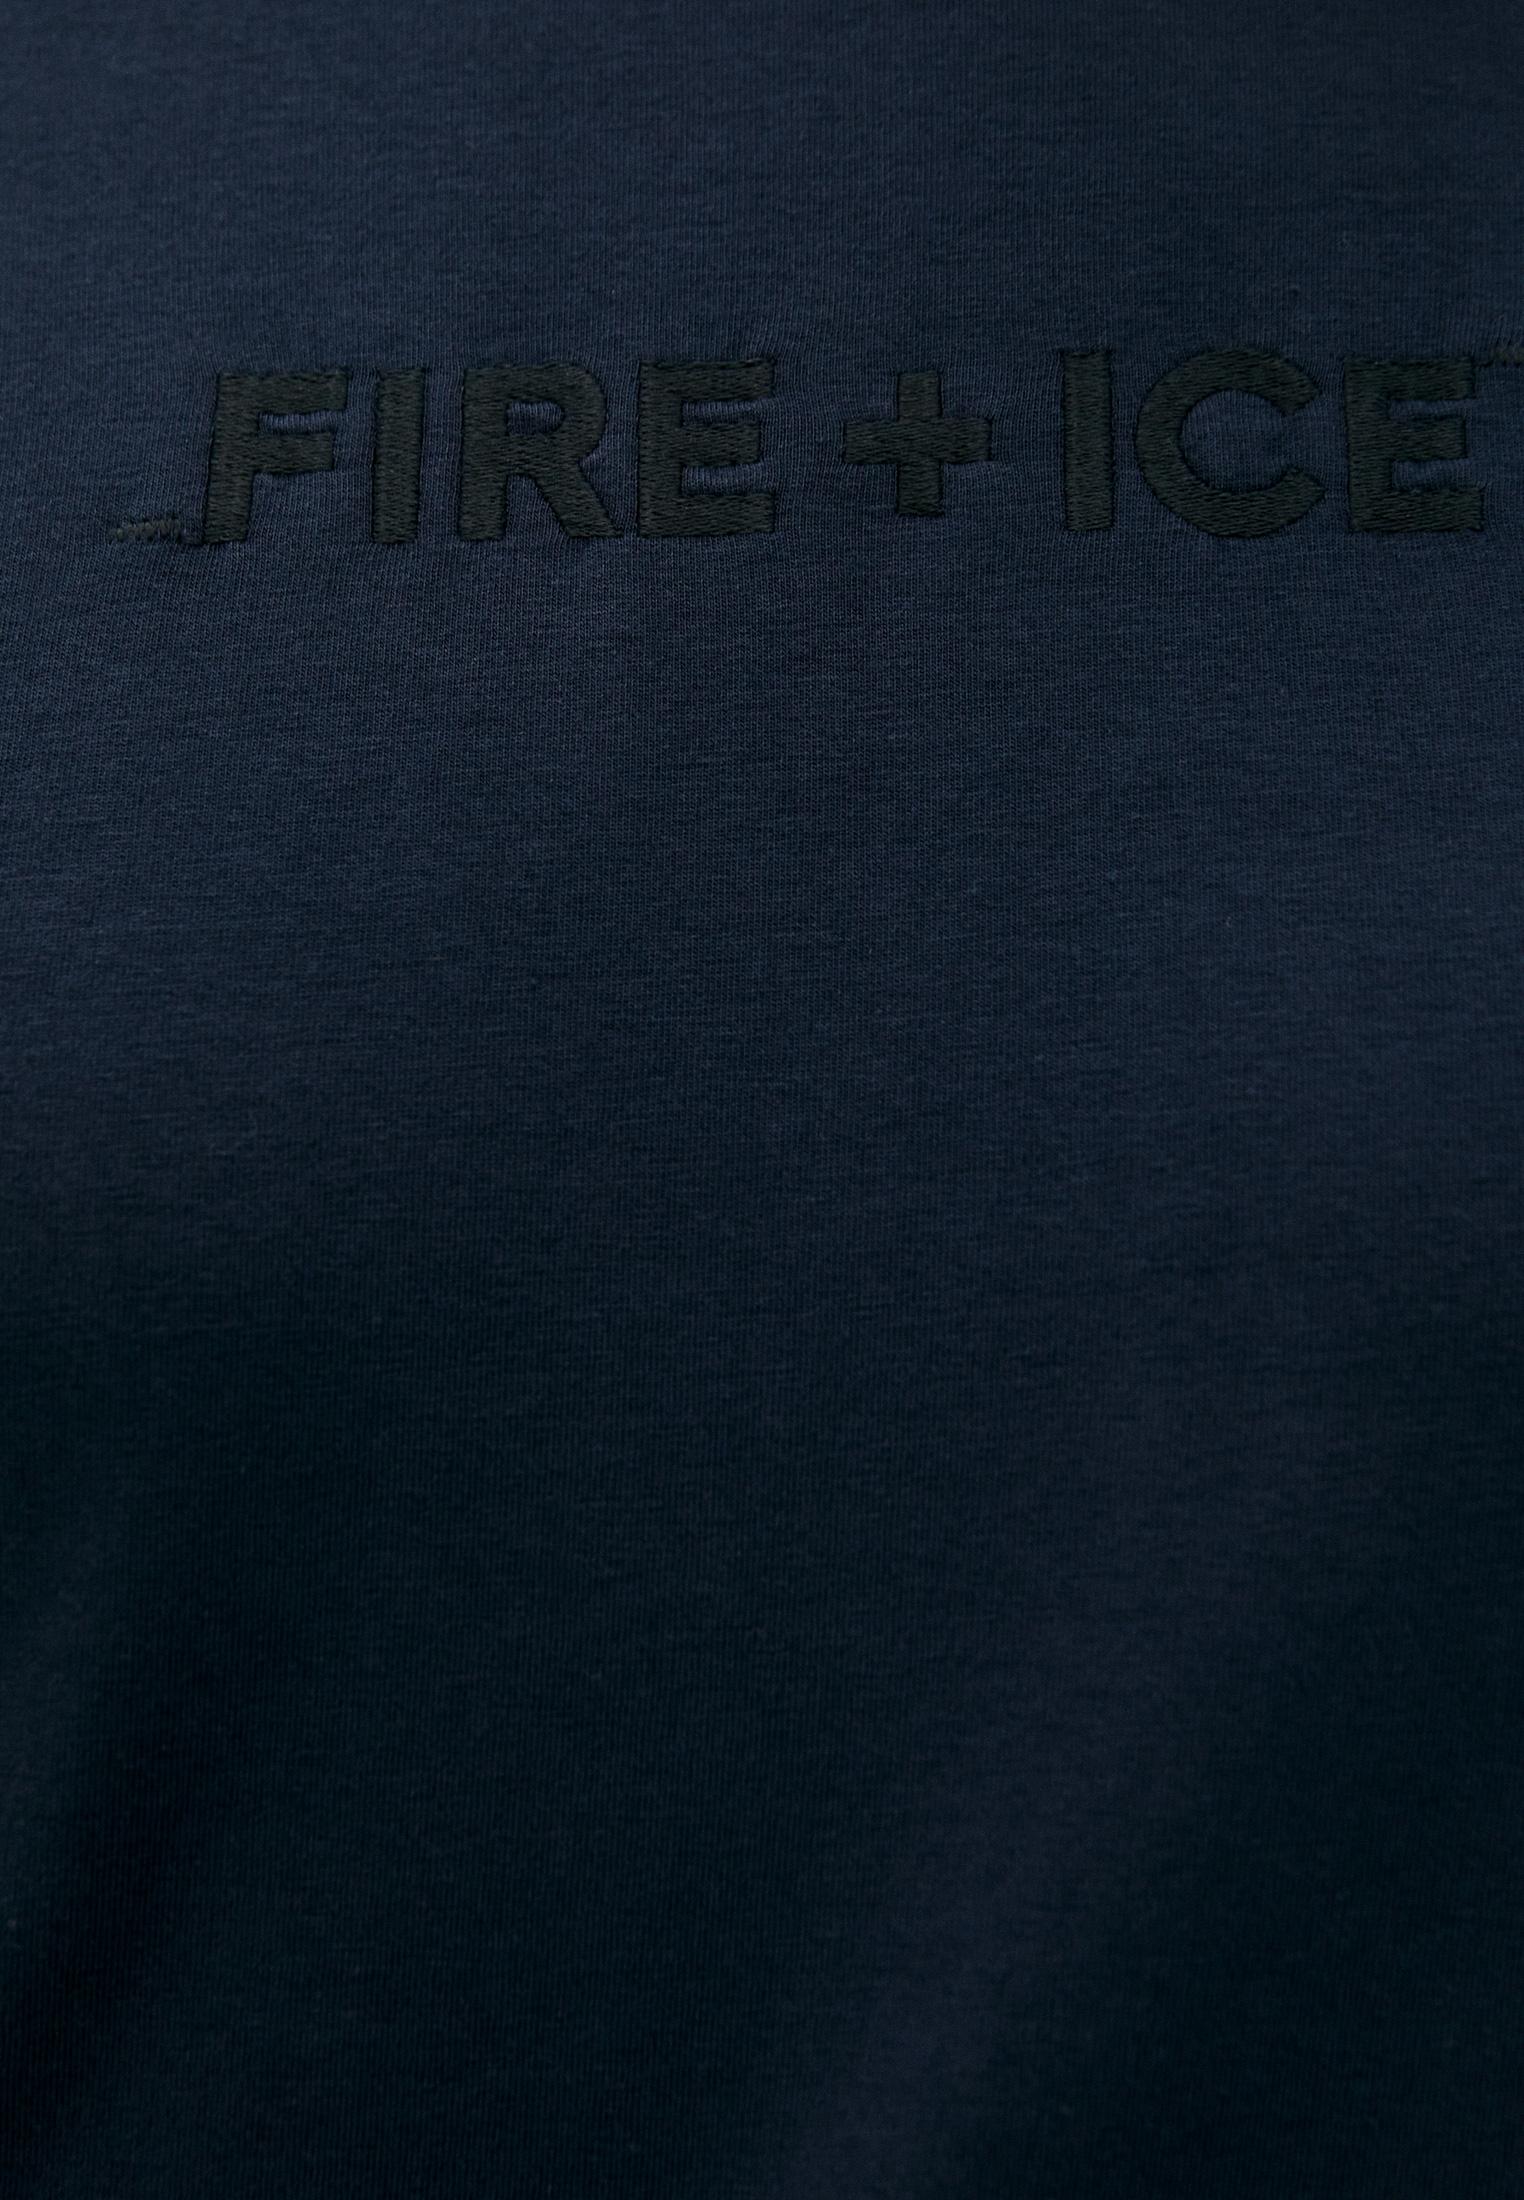 Футболка Bogner Fire+Ice 54413904: изображение 5